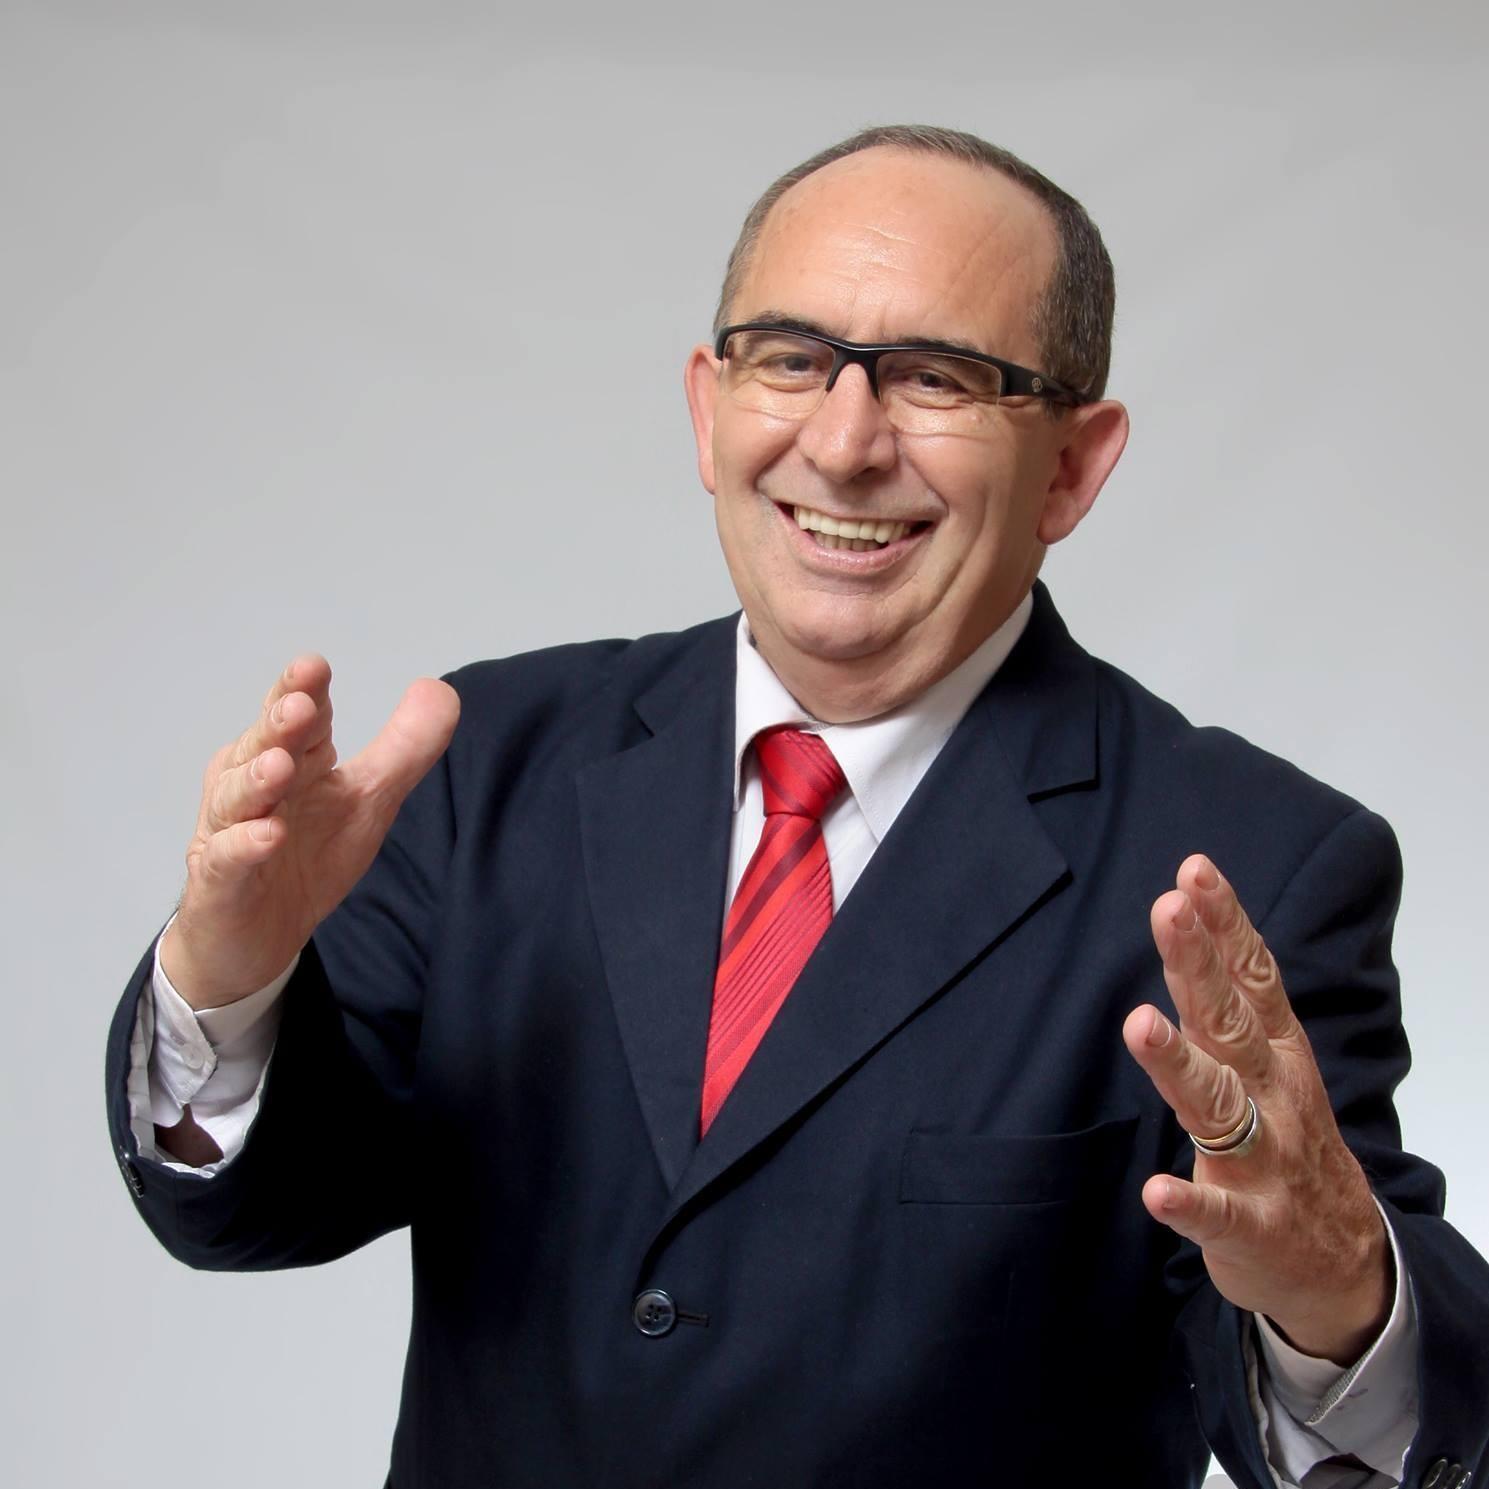 Delegado Rubens Recalcatti, deputado estadual no Paraná, morre aos 72 anos após infarto